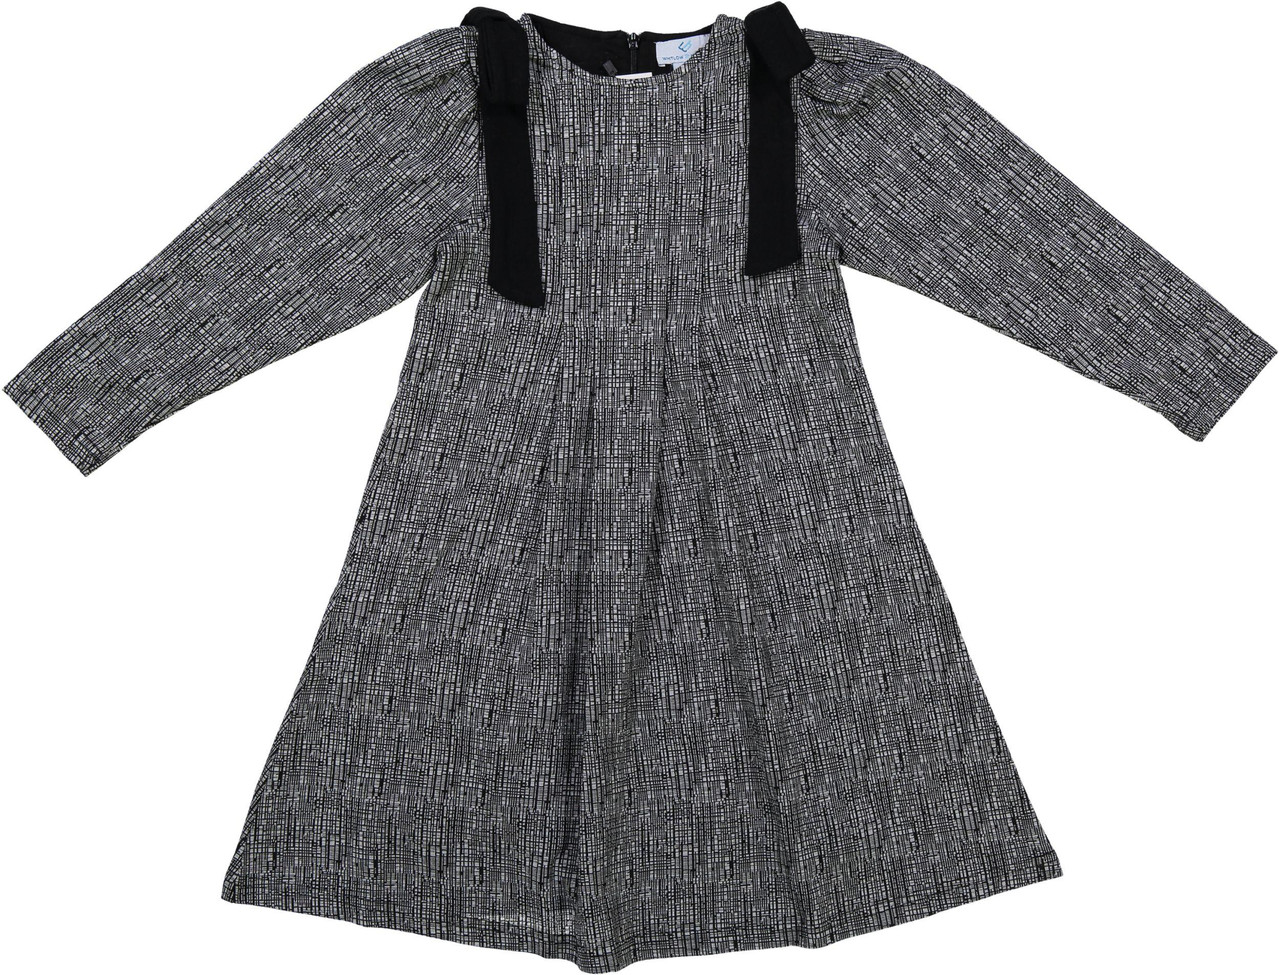 Whitlow & Hawkins Girls Shoulder Bow Dress - WHF191023